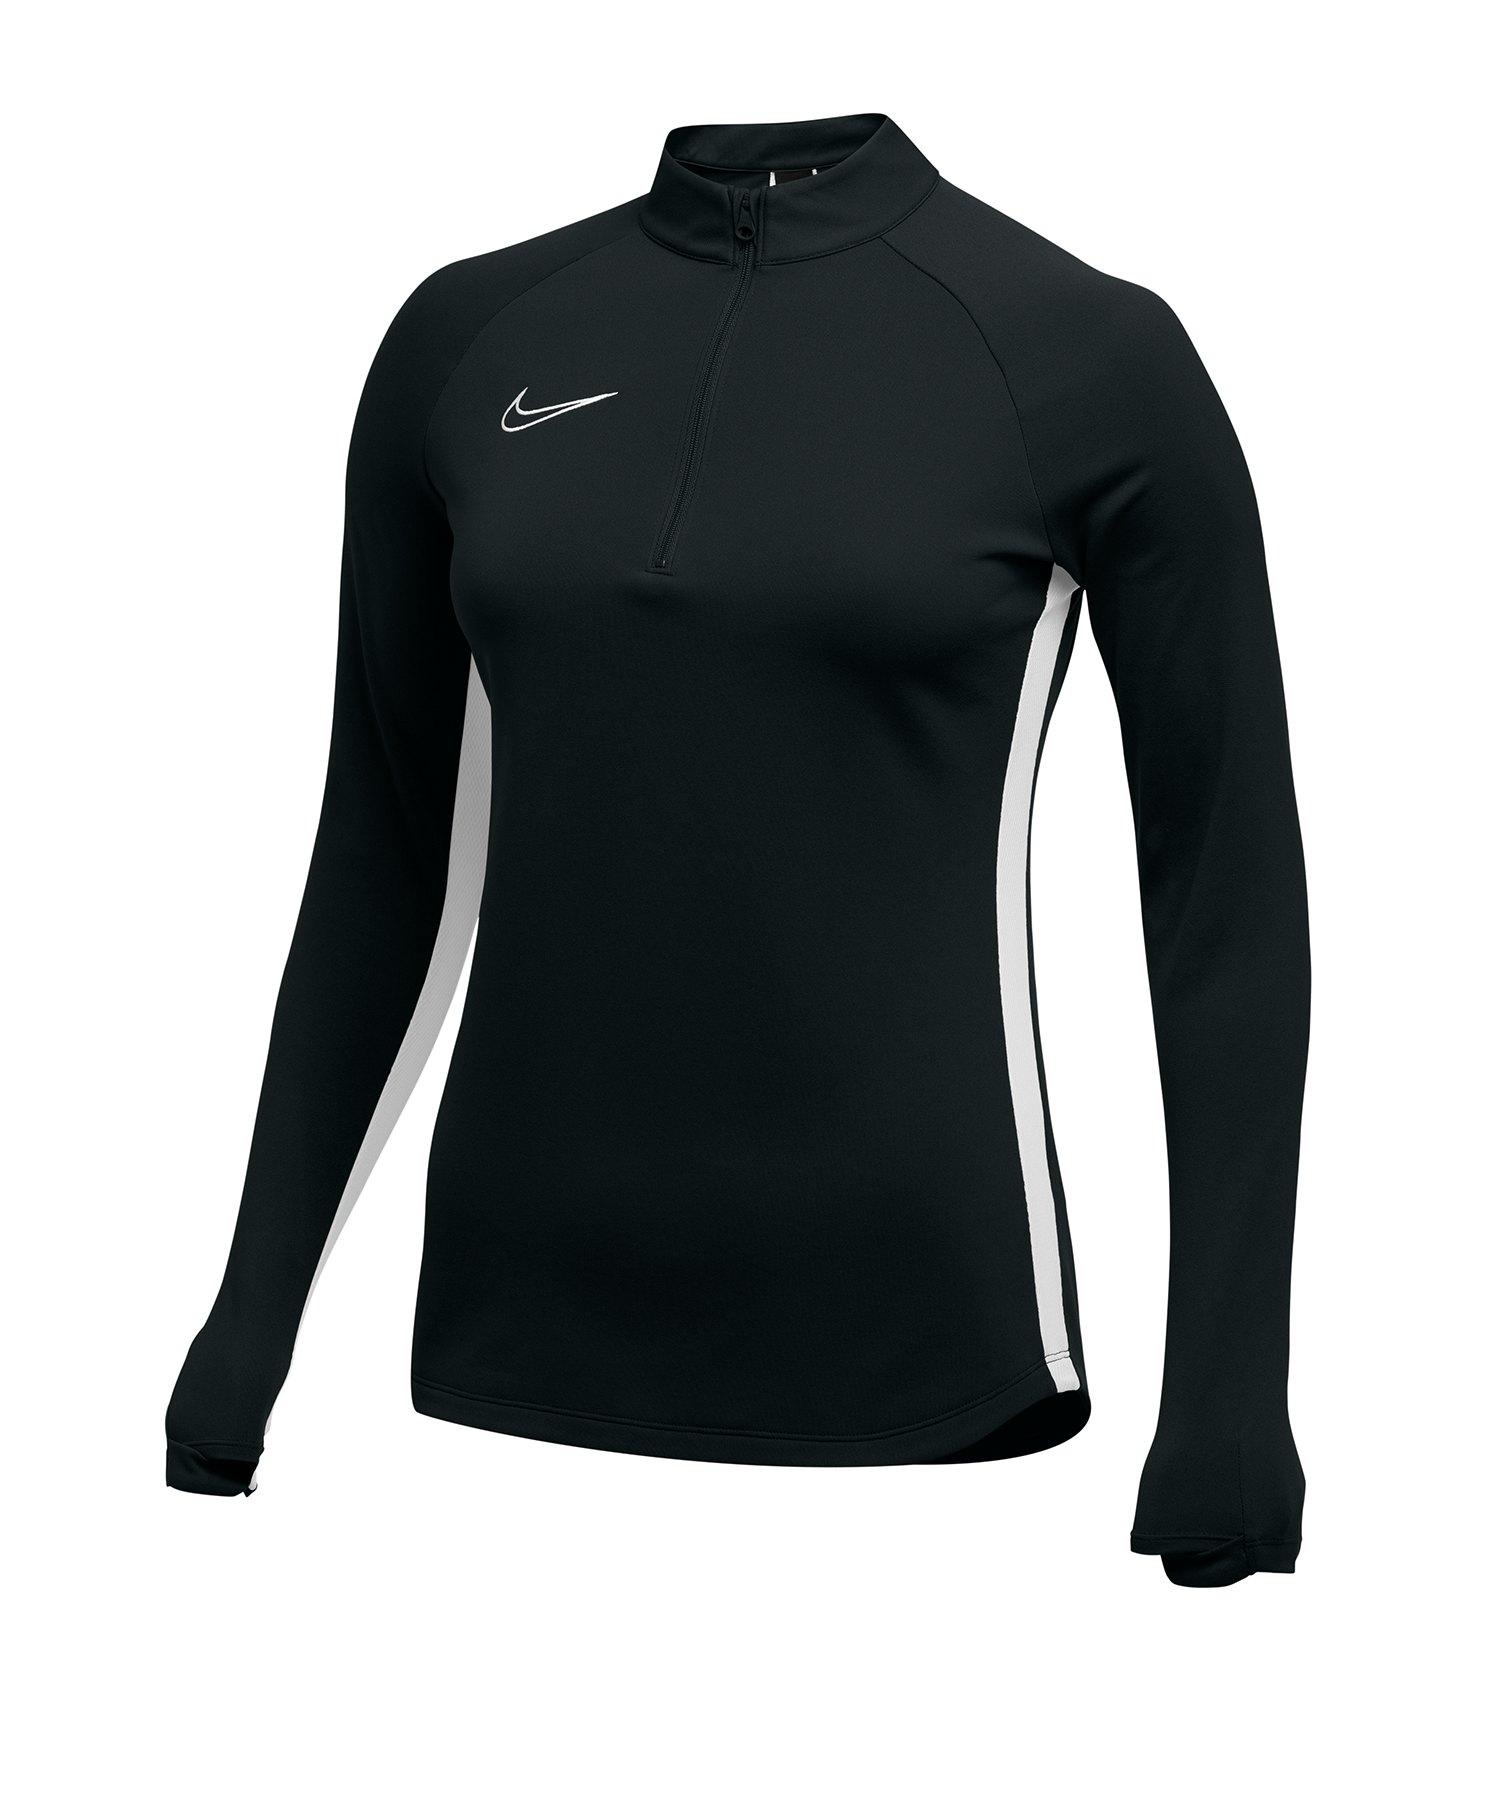 Nike Academy 19 Drill Top Sweatshirt Damen F010 - schwarz